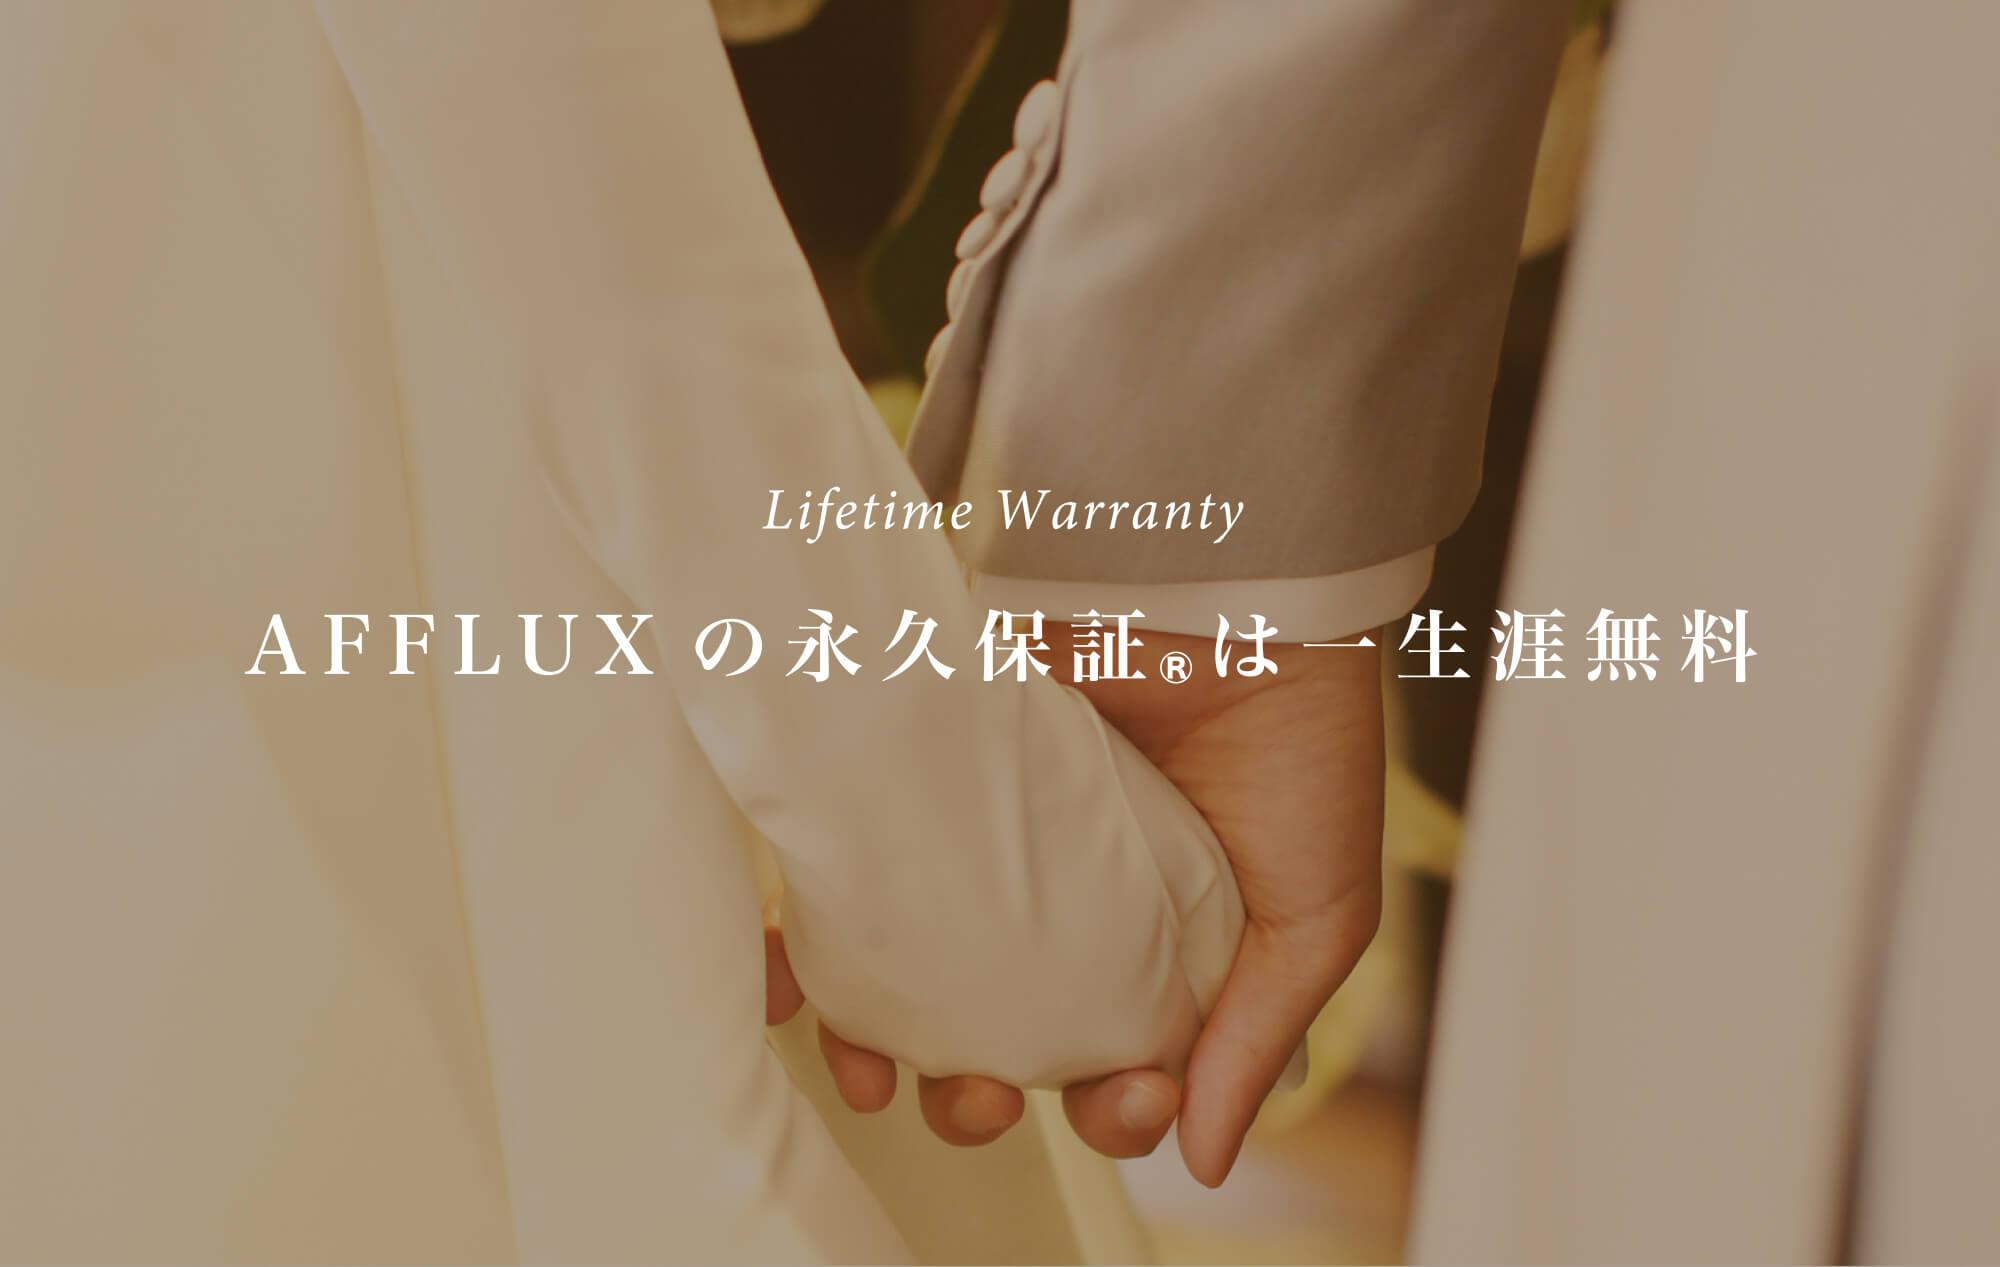 Lifetime Warranty AFFLUXの永久保障®は一生涯無料